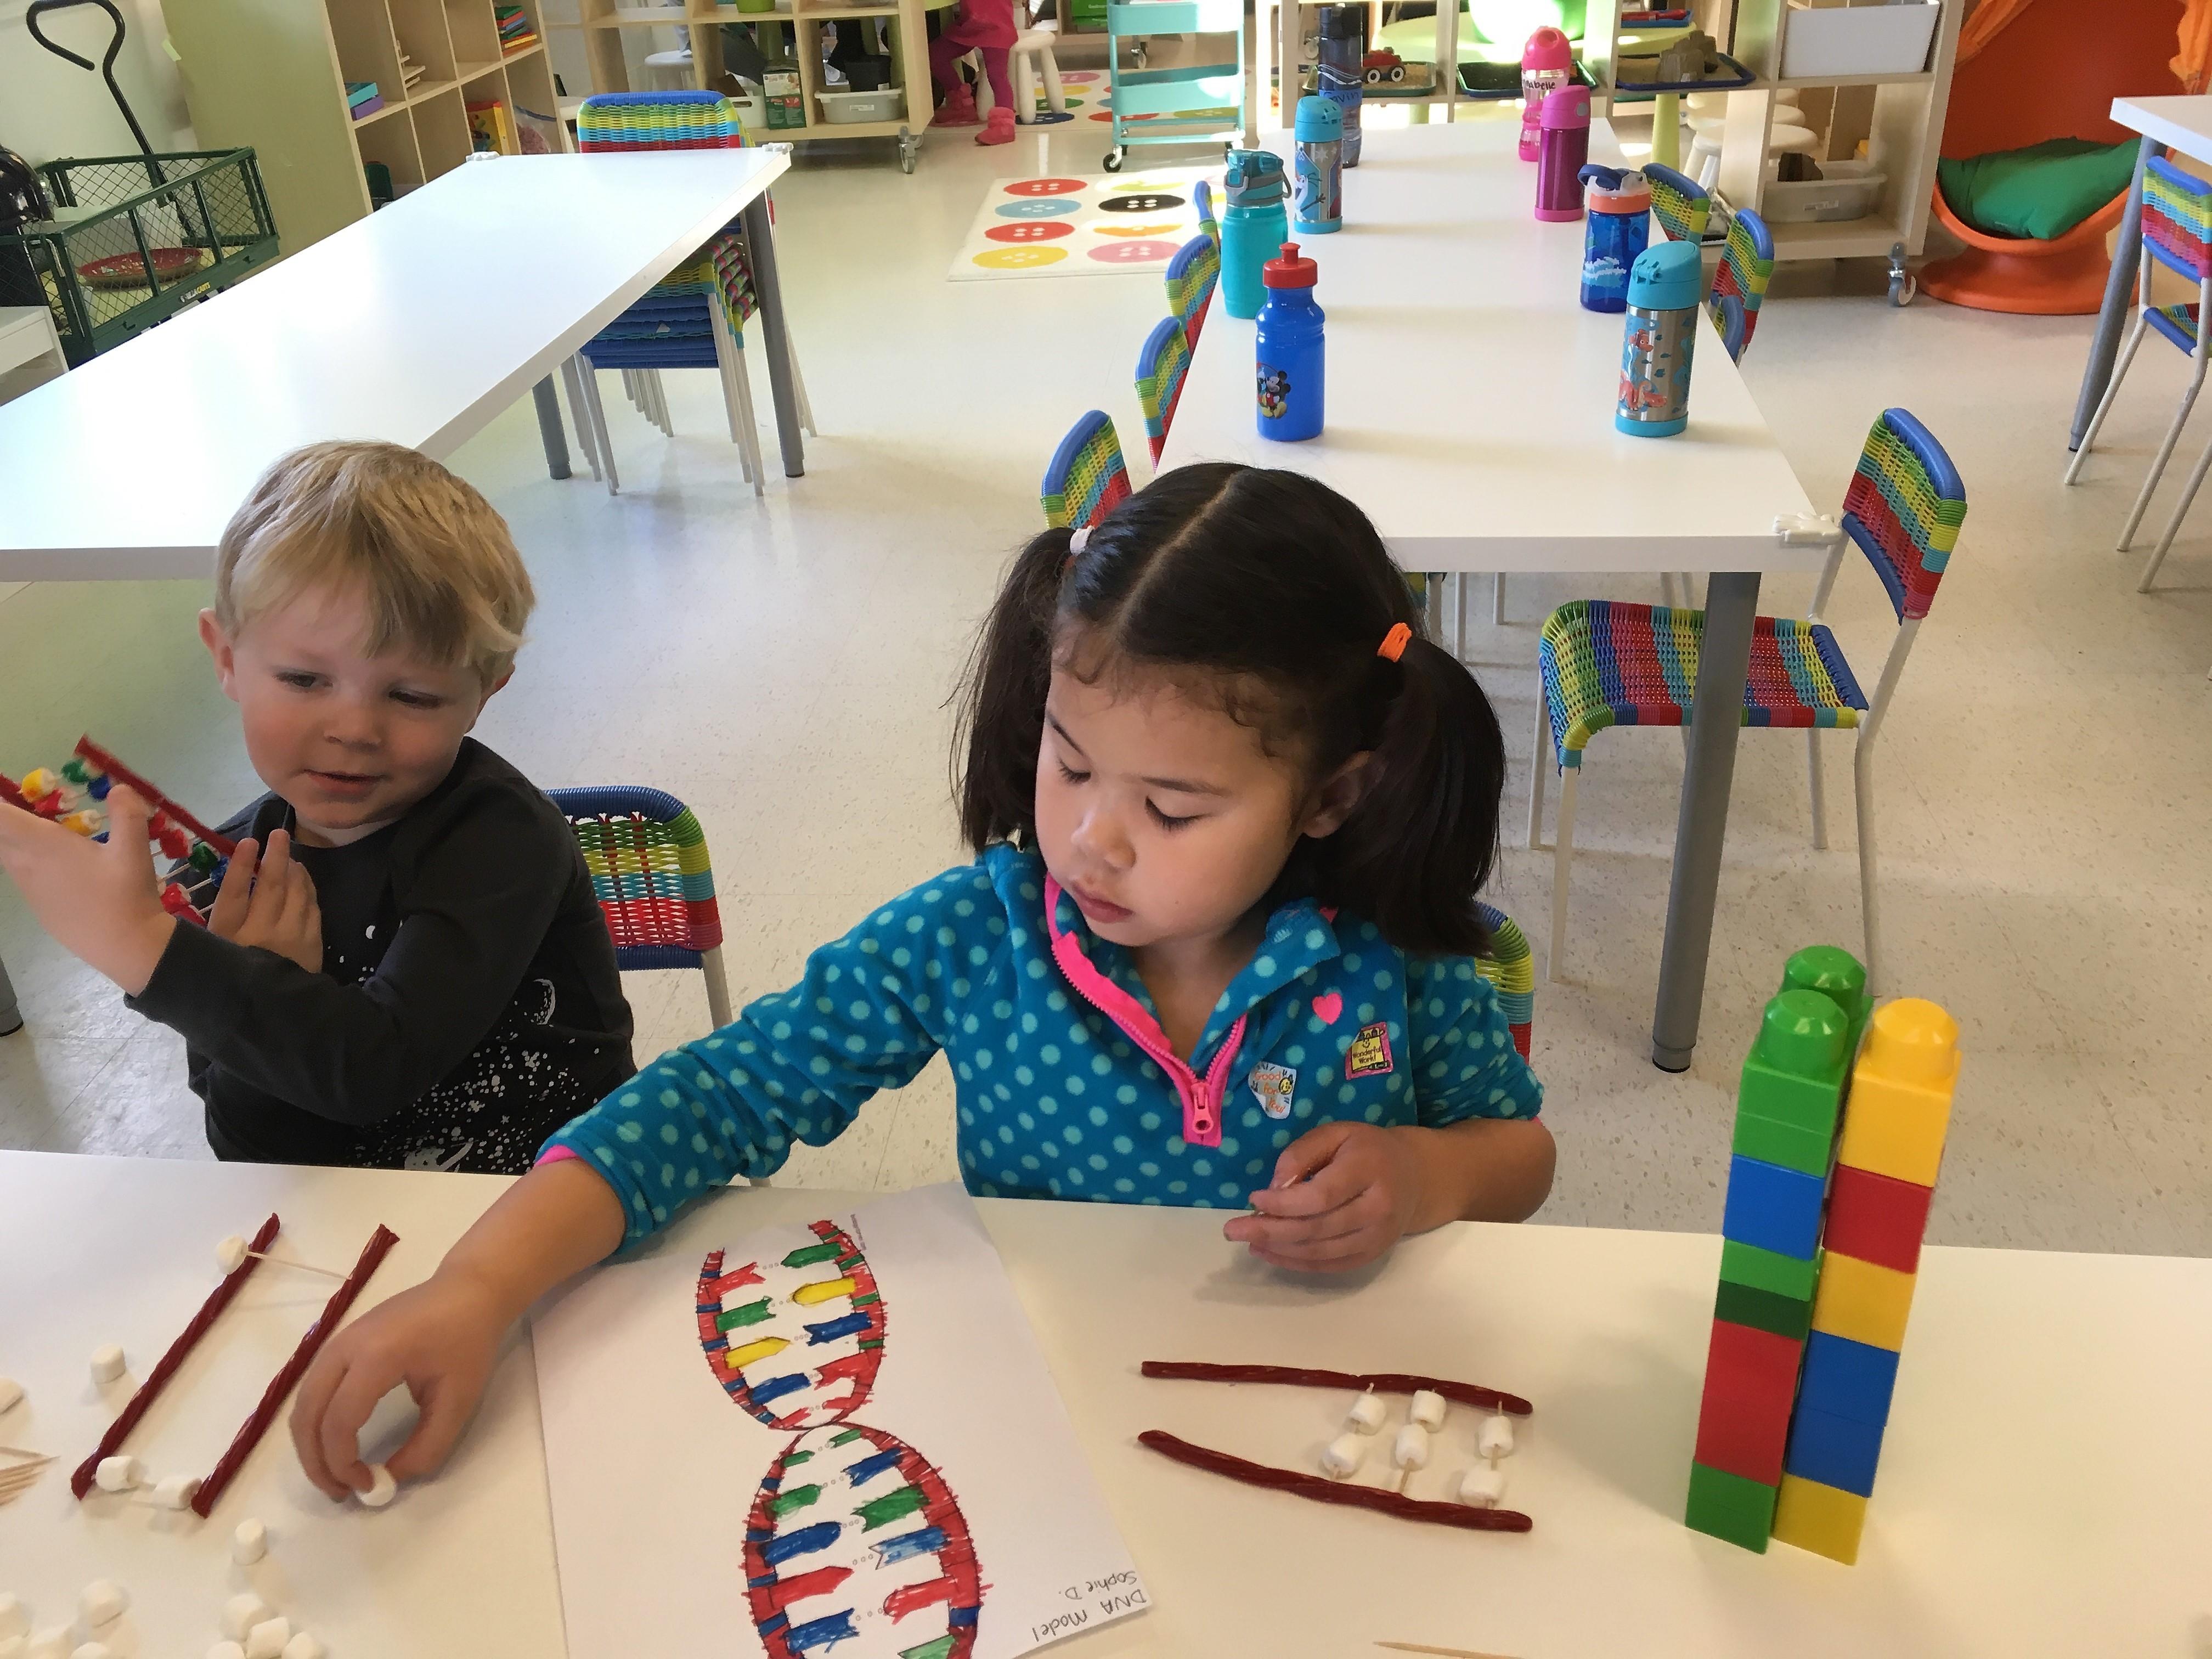 Center Stage Preschool image 41